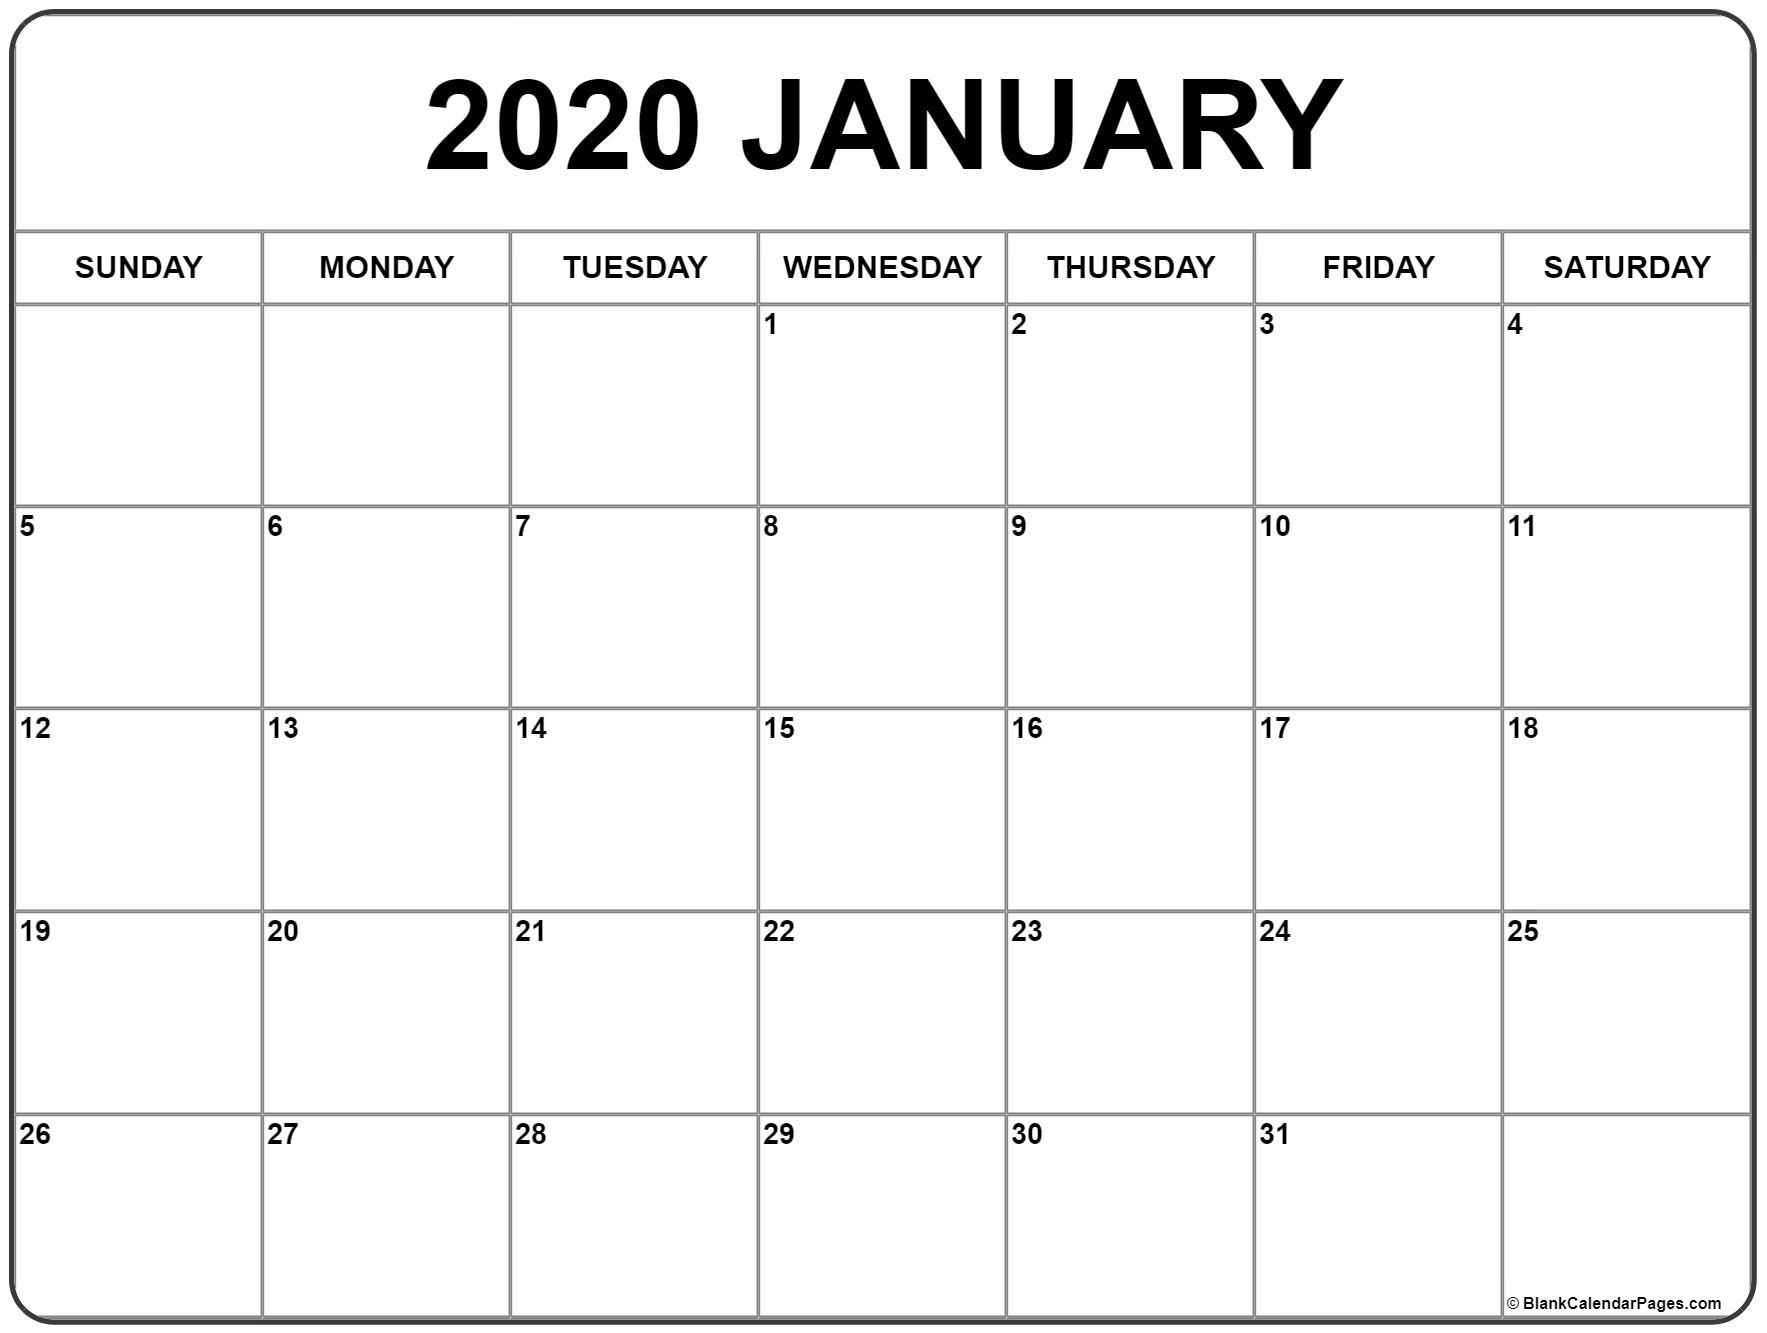 January 2020 Calendar | Free Printable Monthly Calendars-Calendar Of January 2020